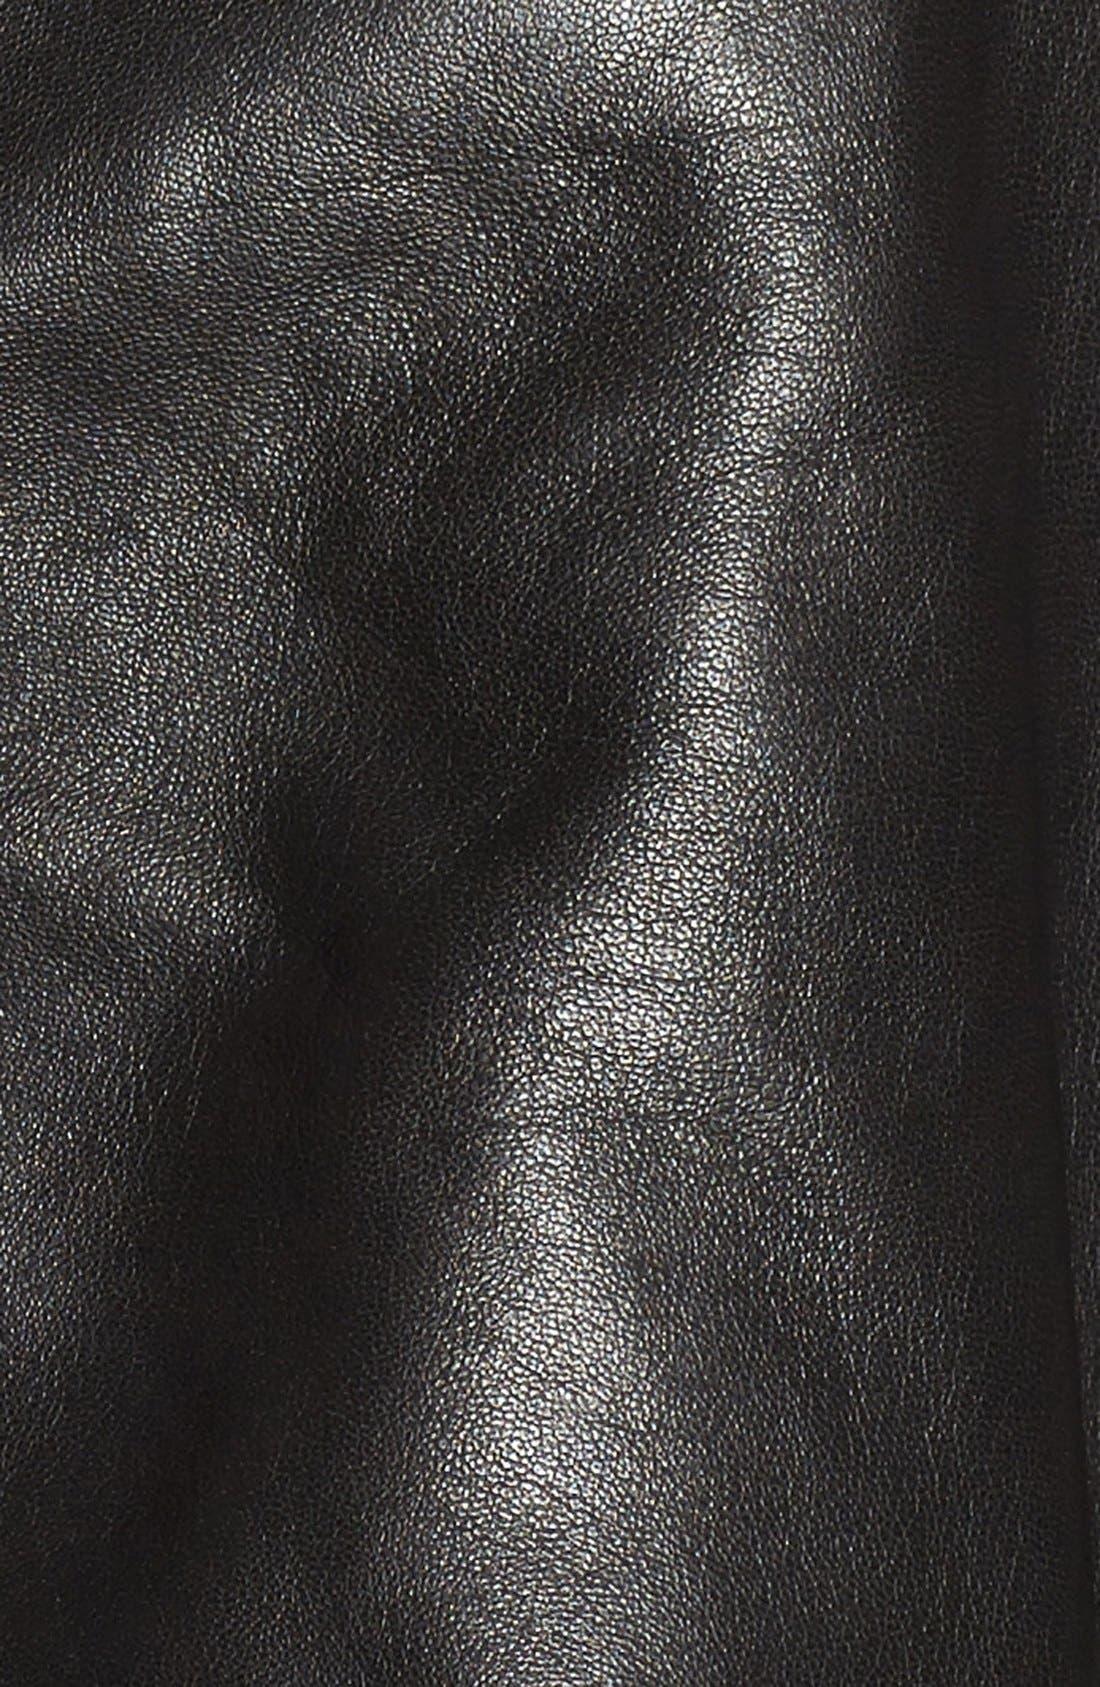 Alternate Image 5  - Badgley Mischka 'Irina' Leather Moto Jacket with Genuine Shearling Collar